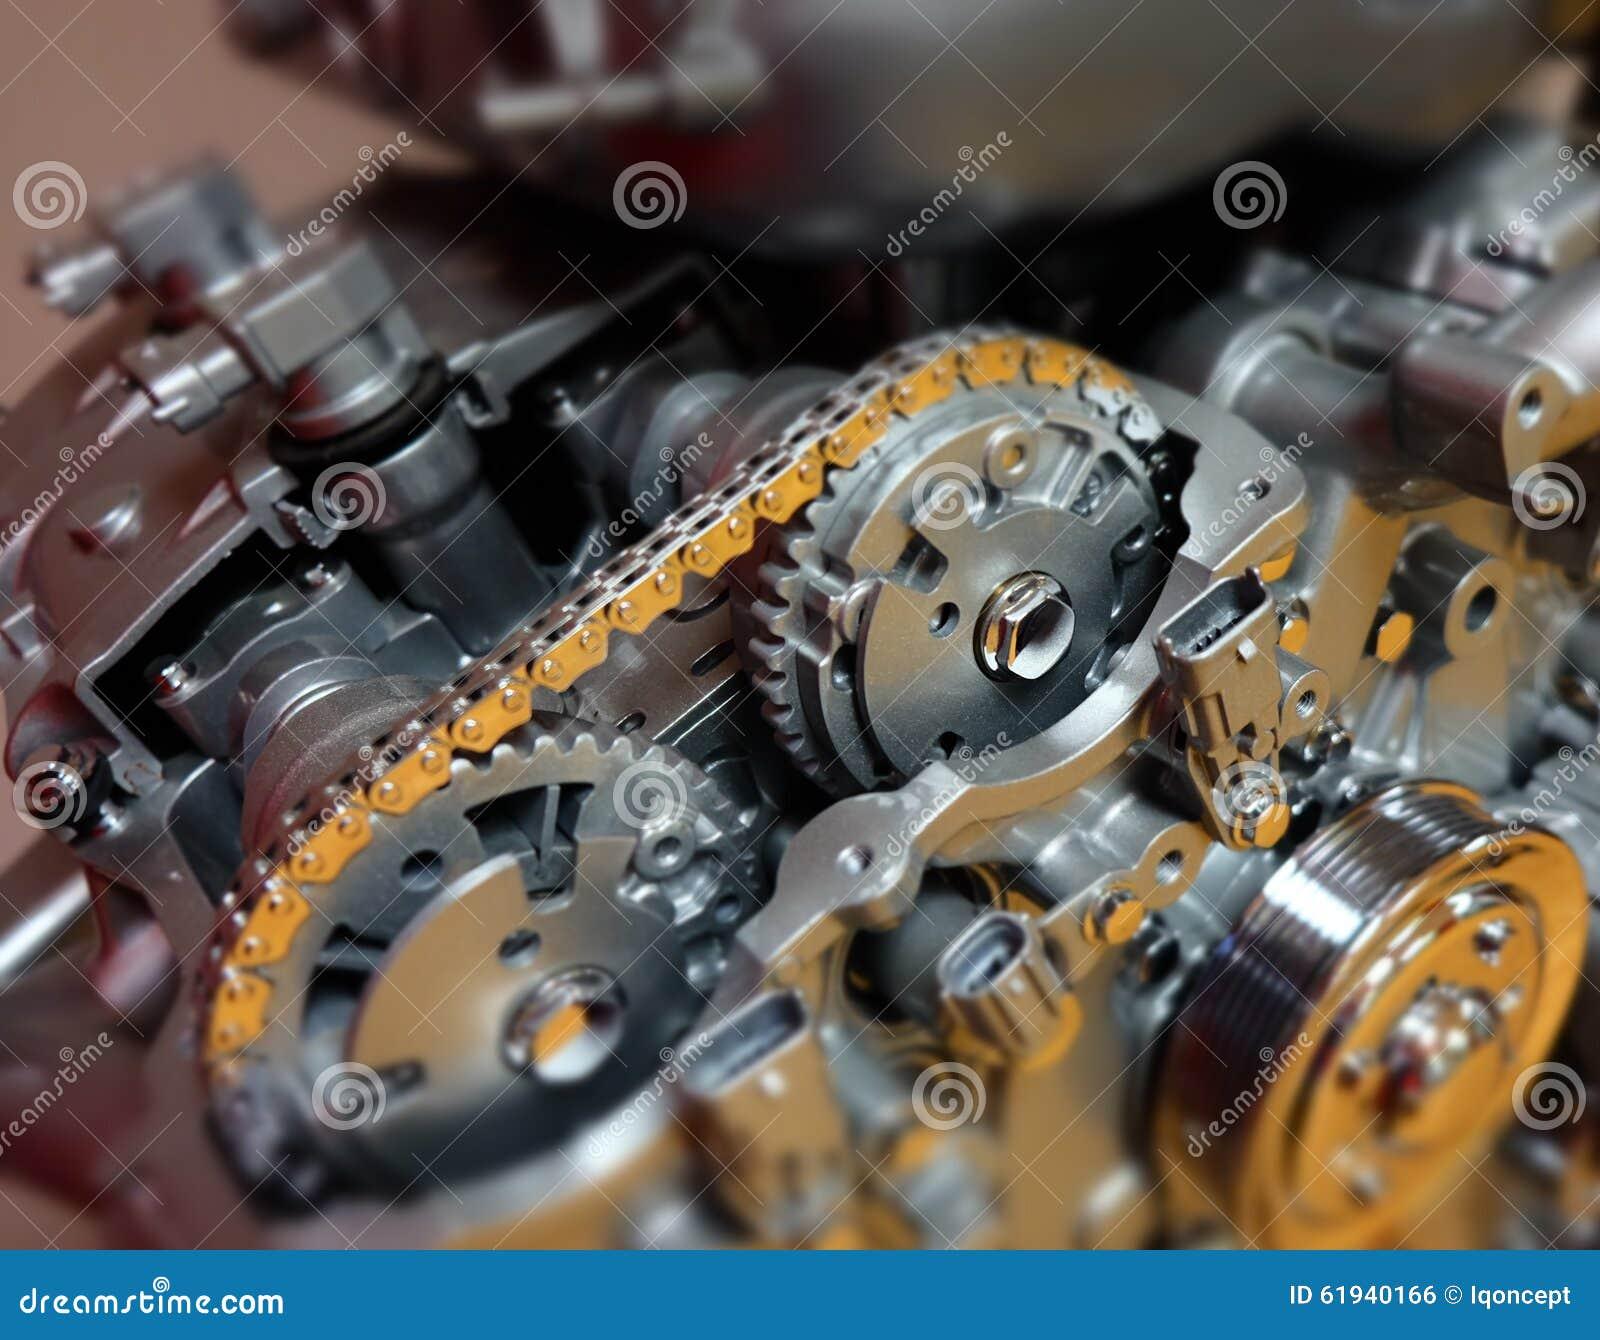 Engineering Motor Gears Automotive Designing Power Stock